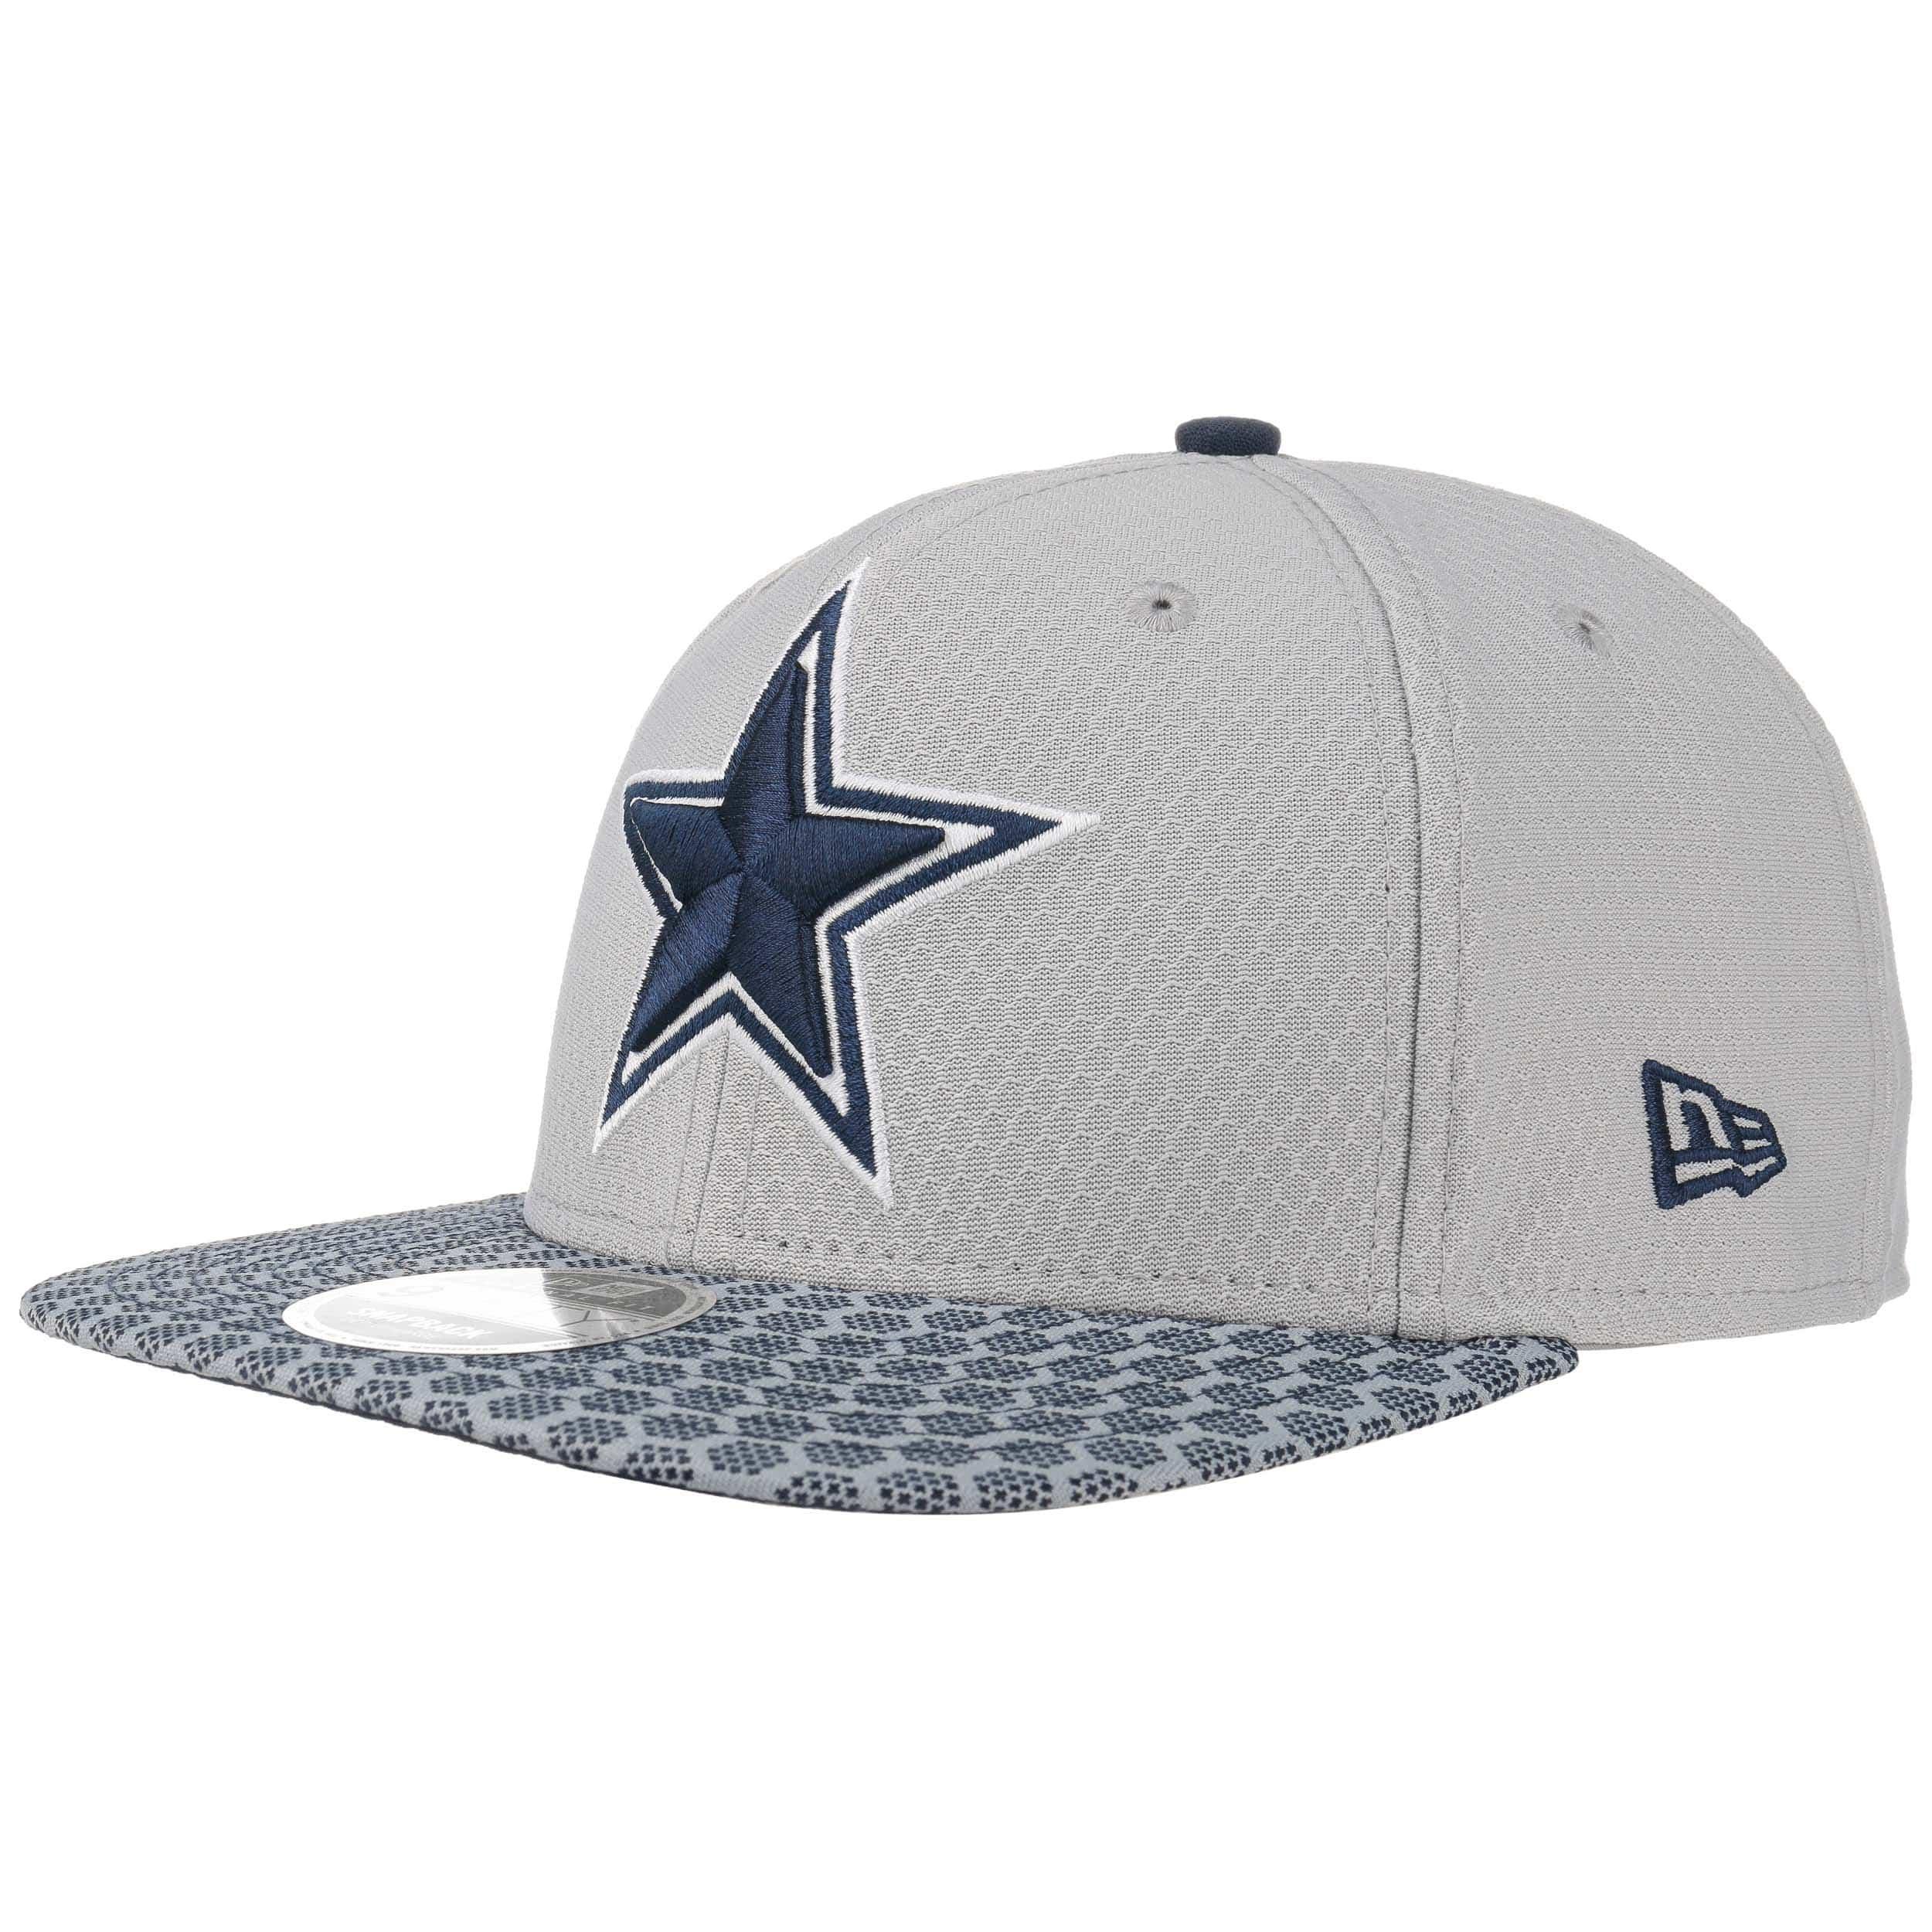 e1fcbefd9ea 9fifty Onf Dallas Cowboys Cap By New Era 36 95